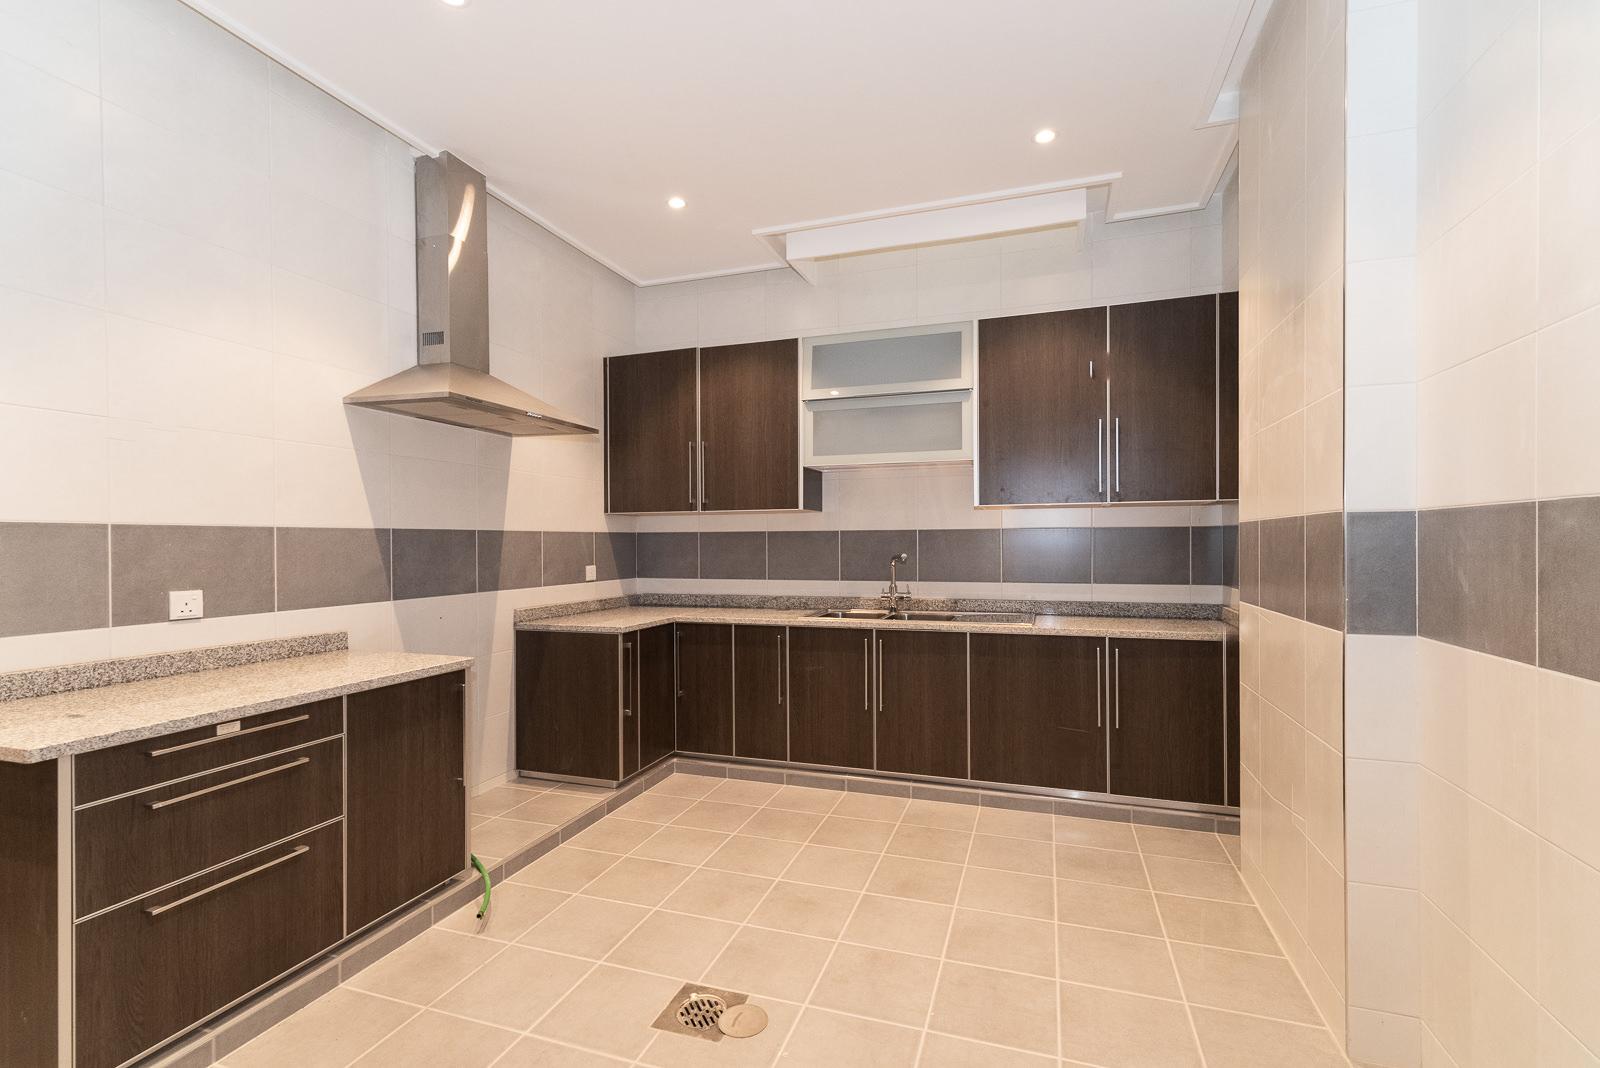 Shuhada – new, unfurnished, three bedroom basement apartment